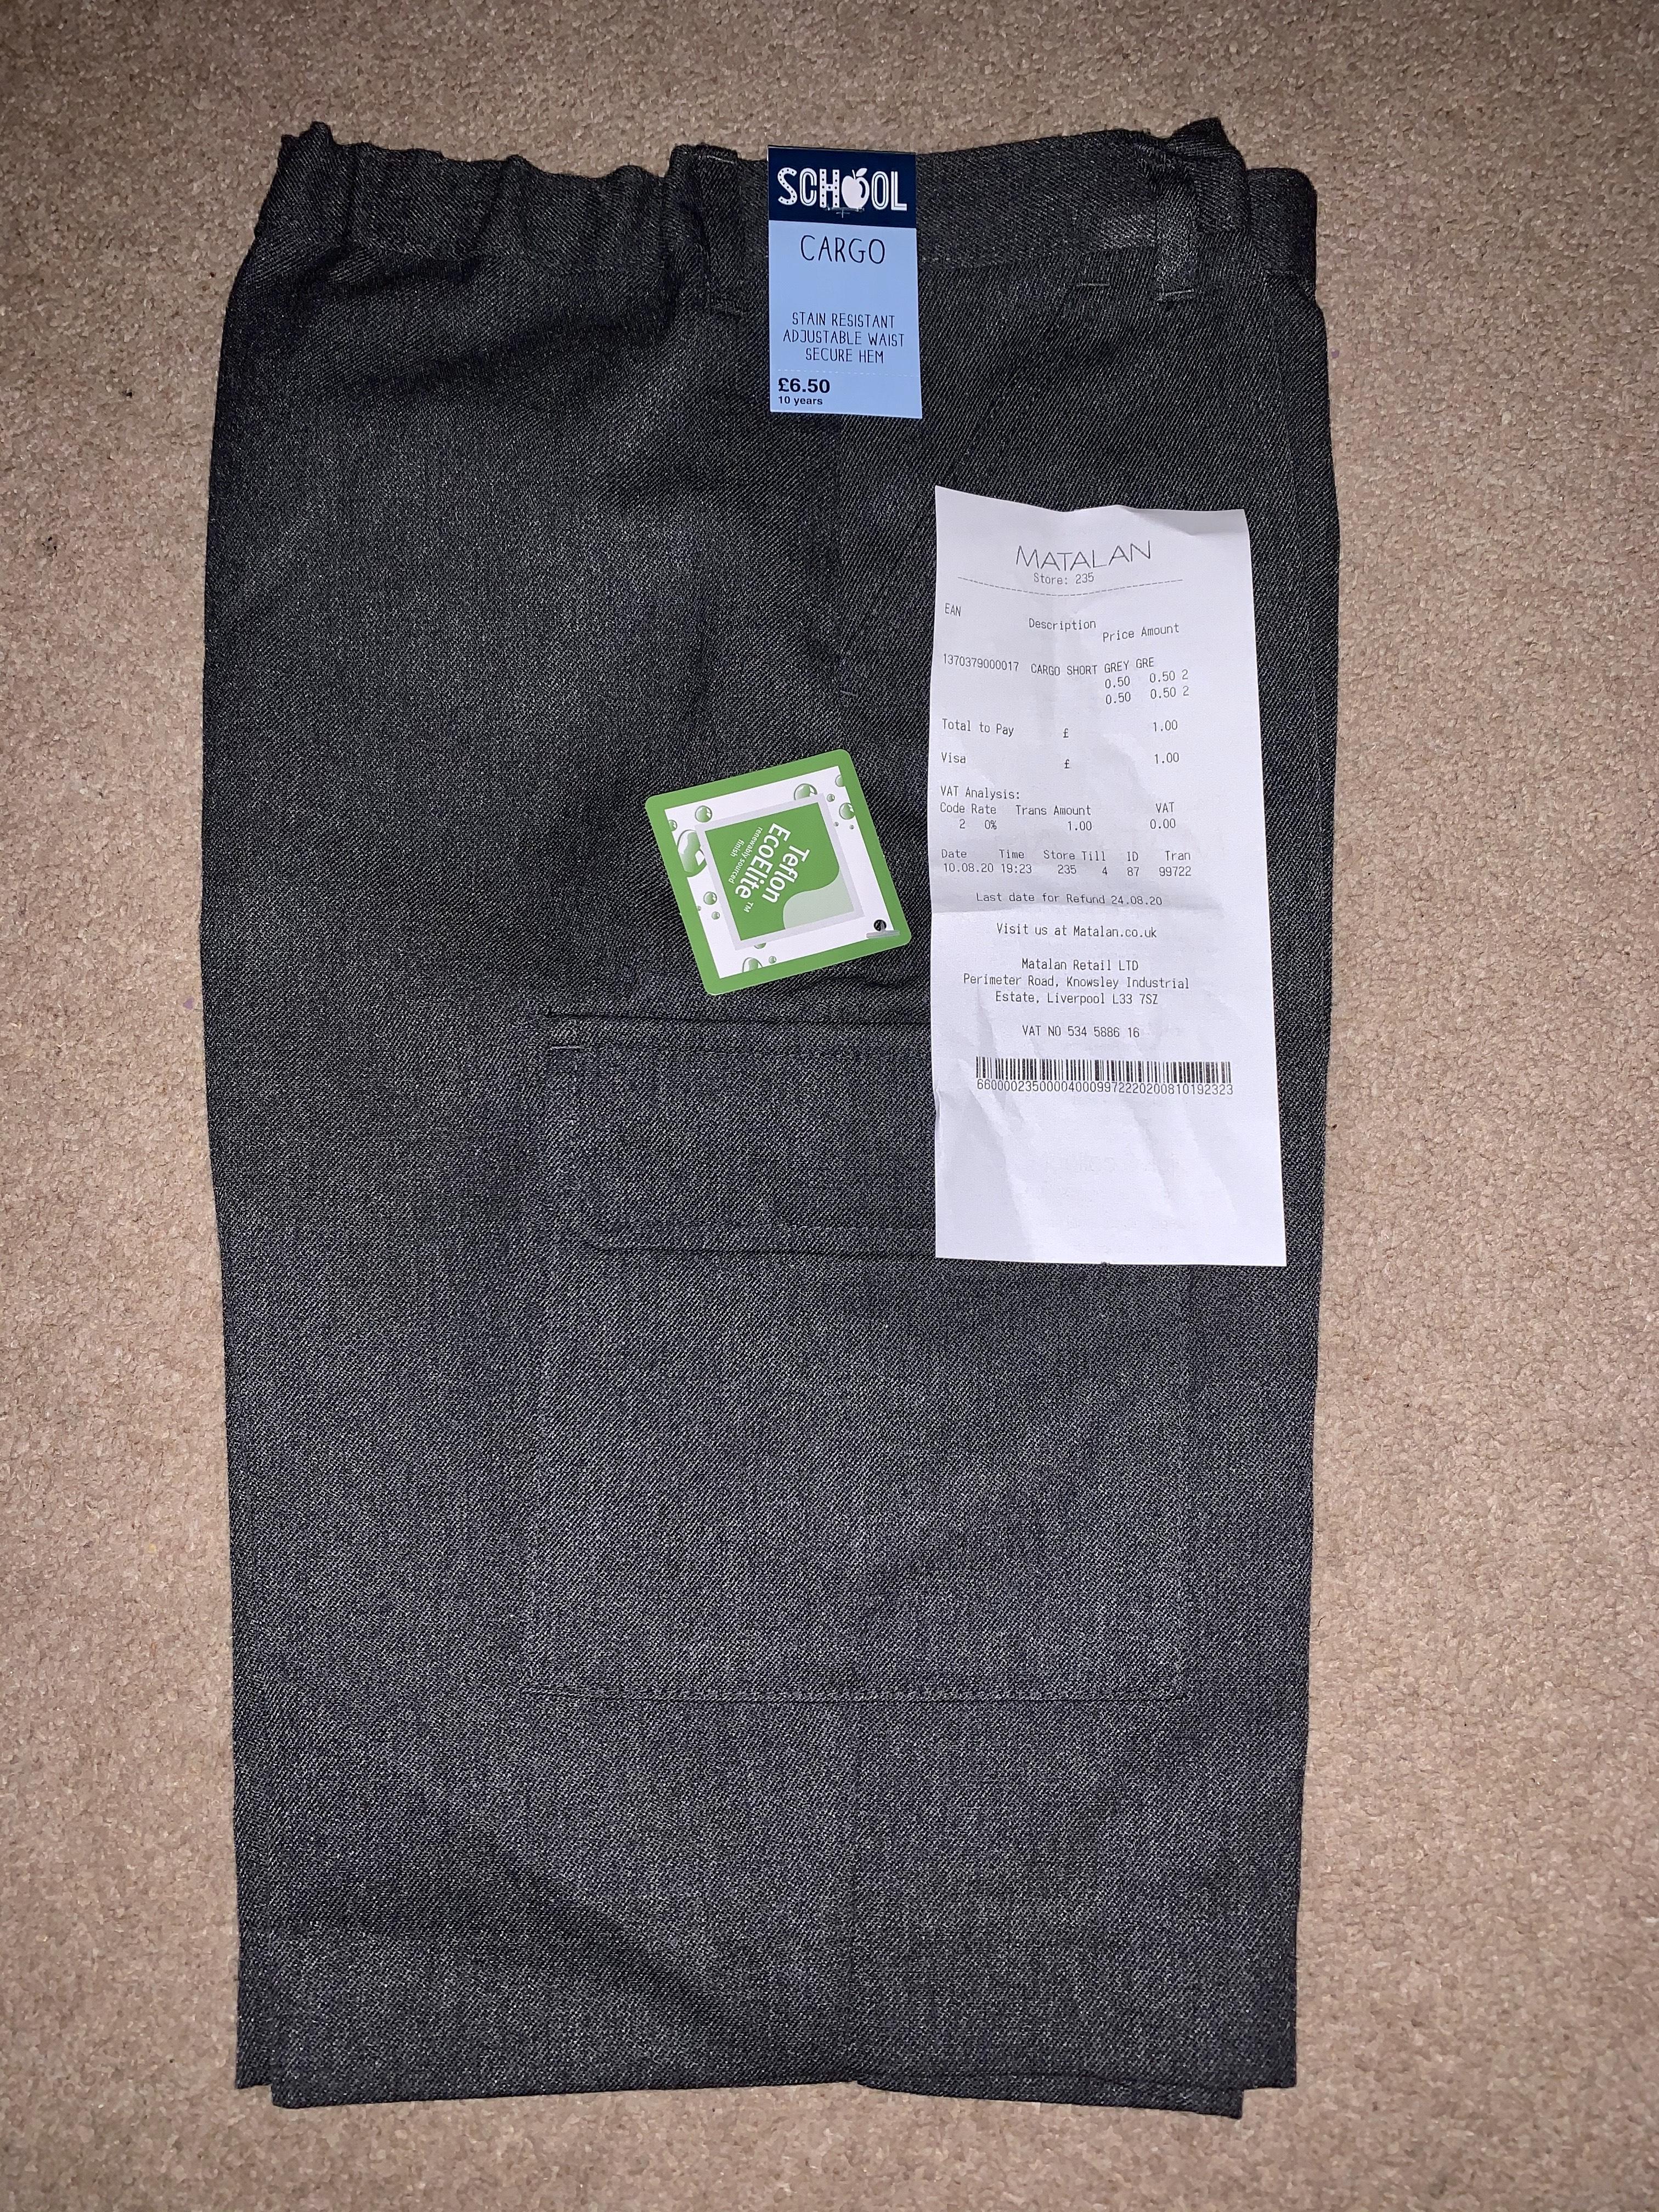 Grey School Cargo Shorts 50p instore @ Matalan Dundee